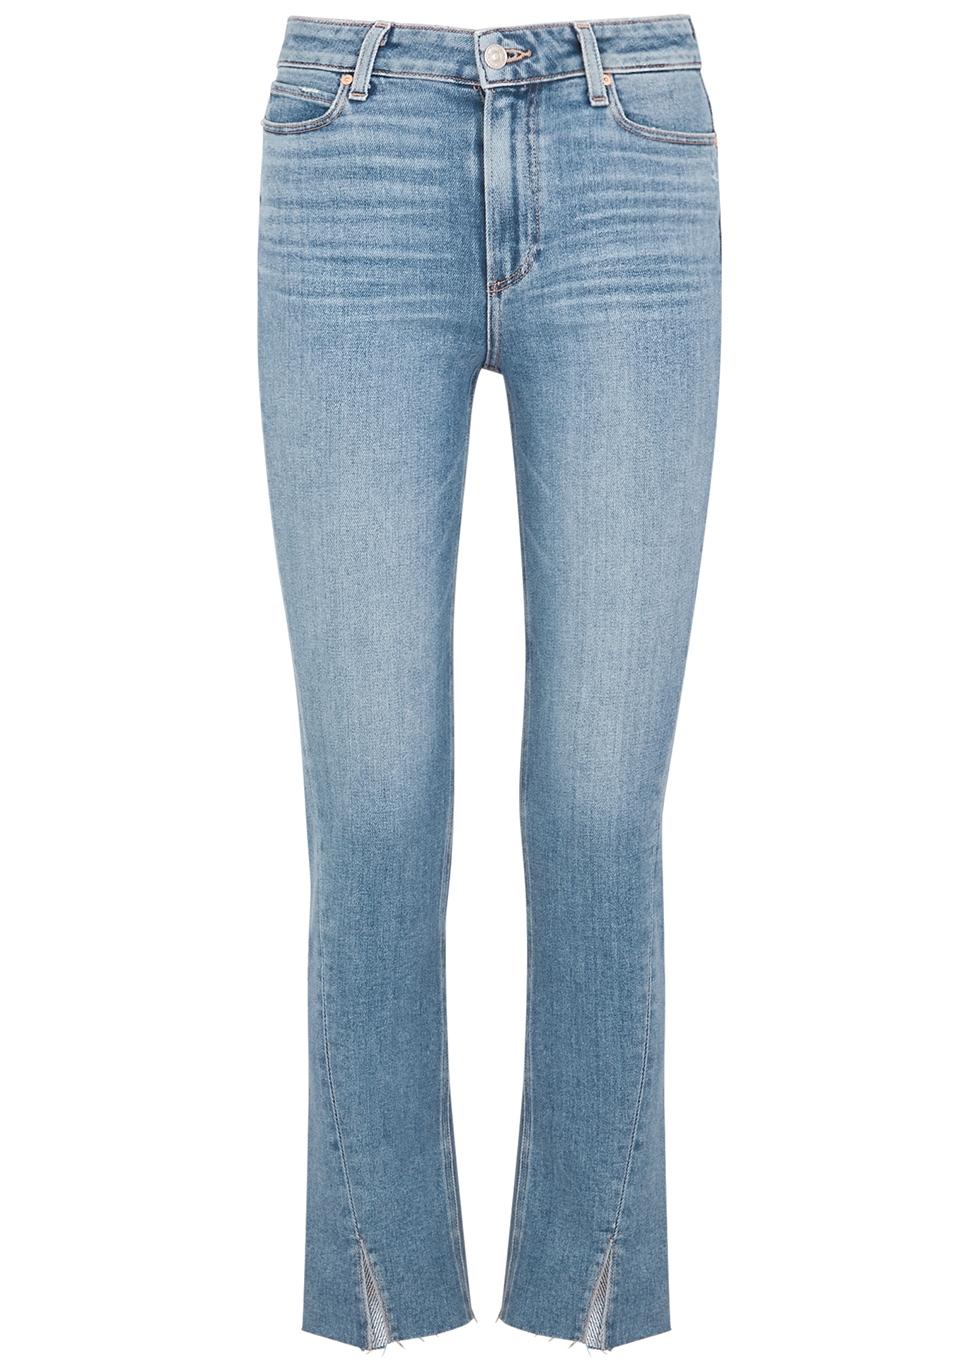 Hoxton blue slim-leg jeans